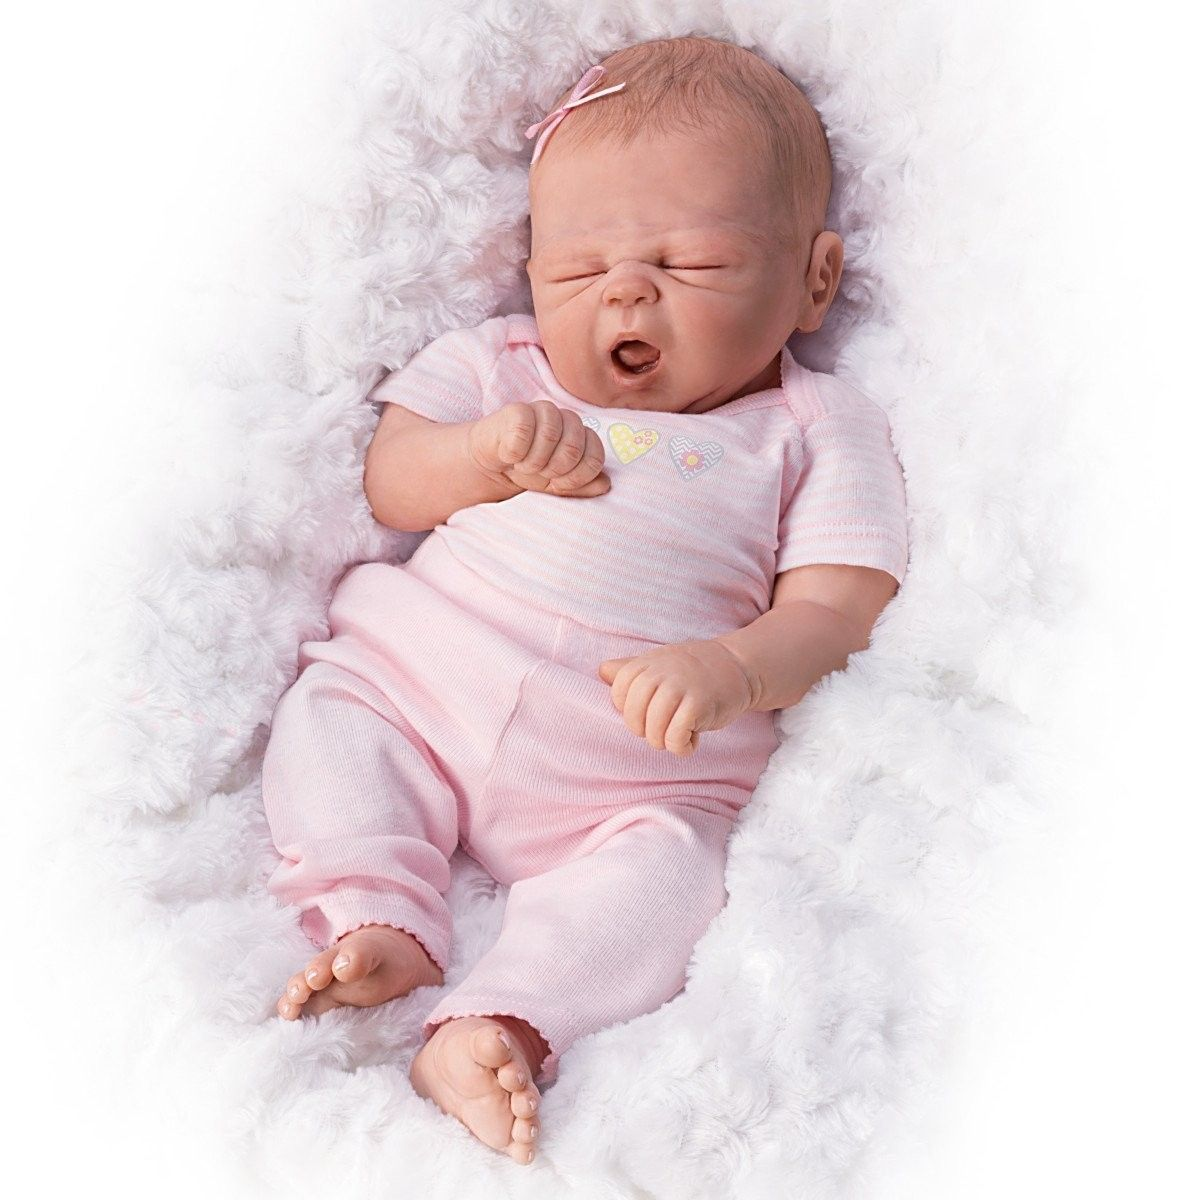 Ashton Drake Violet Parker So Truly Real So Sleepy Girl Baby Doll Poupon Bebes Reborn Poupon En Silicone